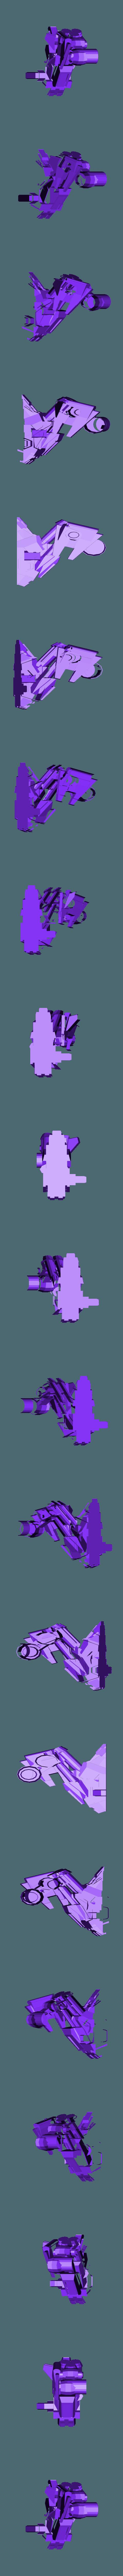 Left_Leg_2.stl Download free STL file Modular Linebacker Mech • 3D printing object, mrhers2